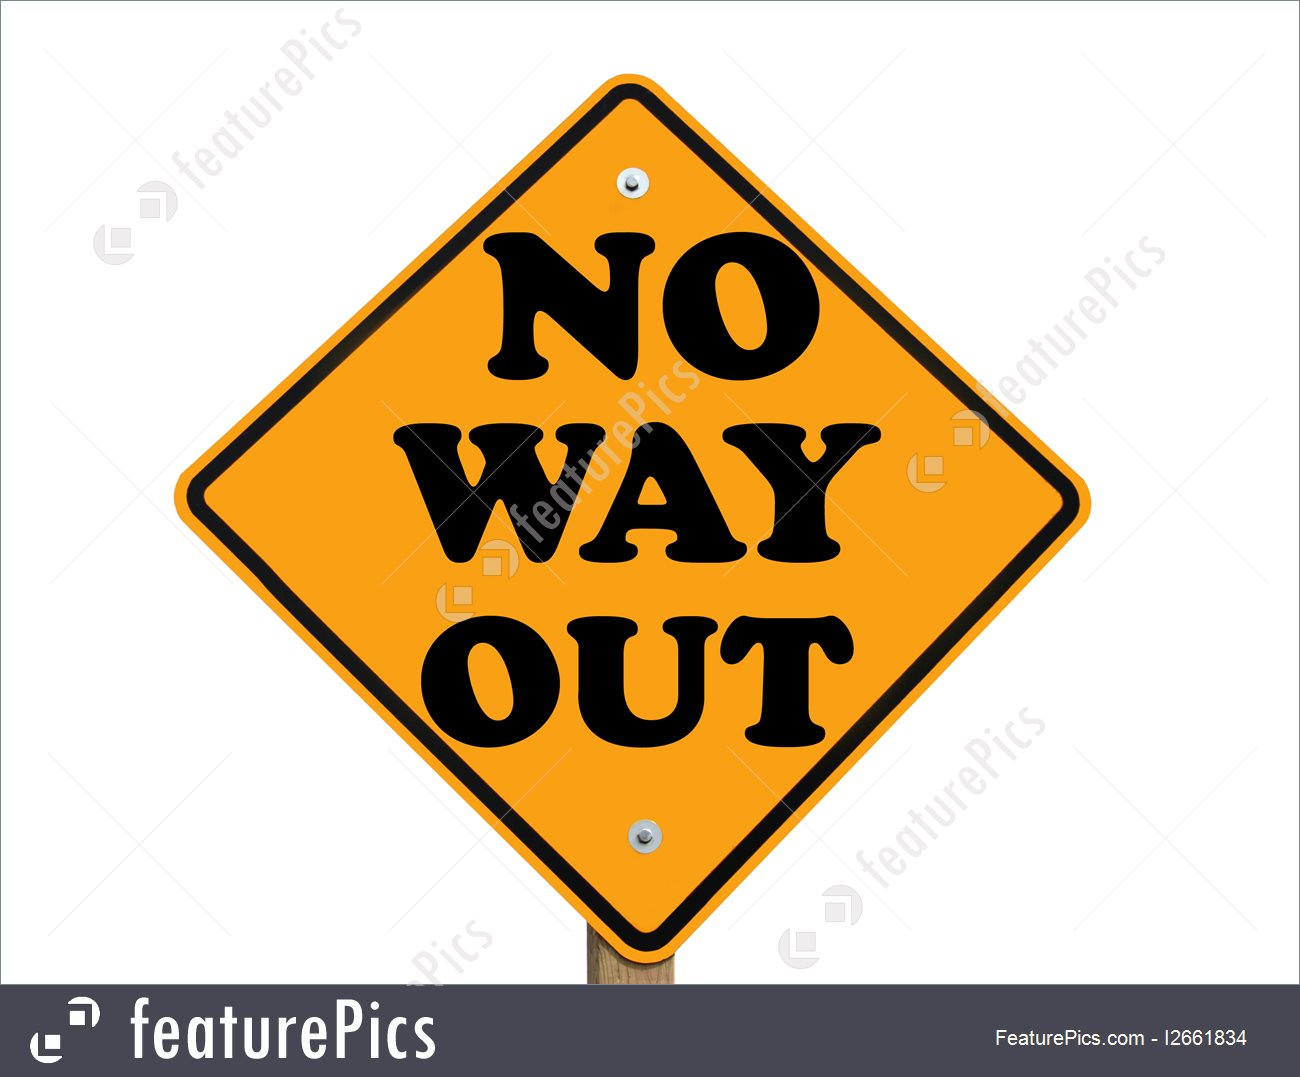 No Way Out Sign Image.